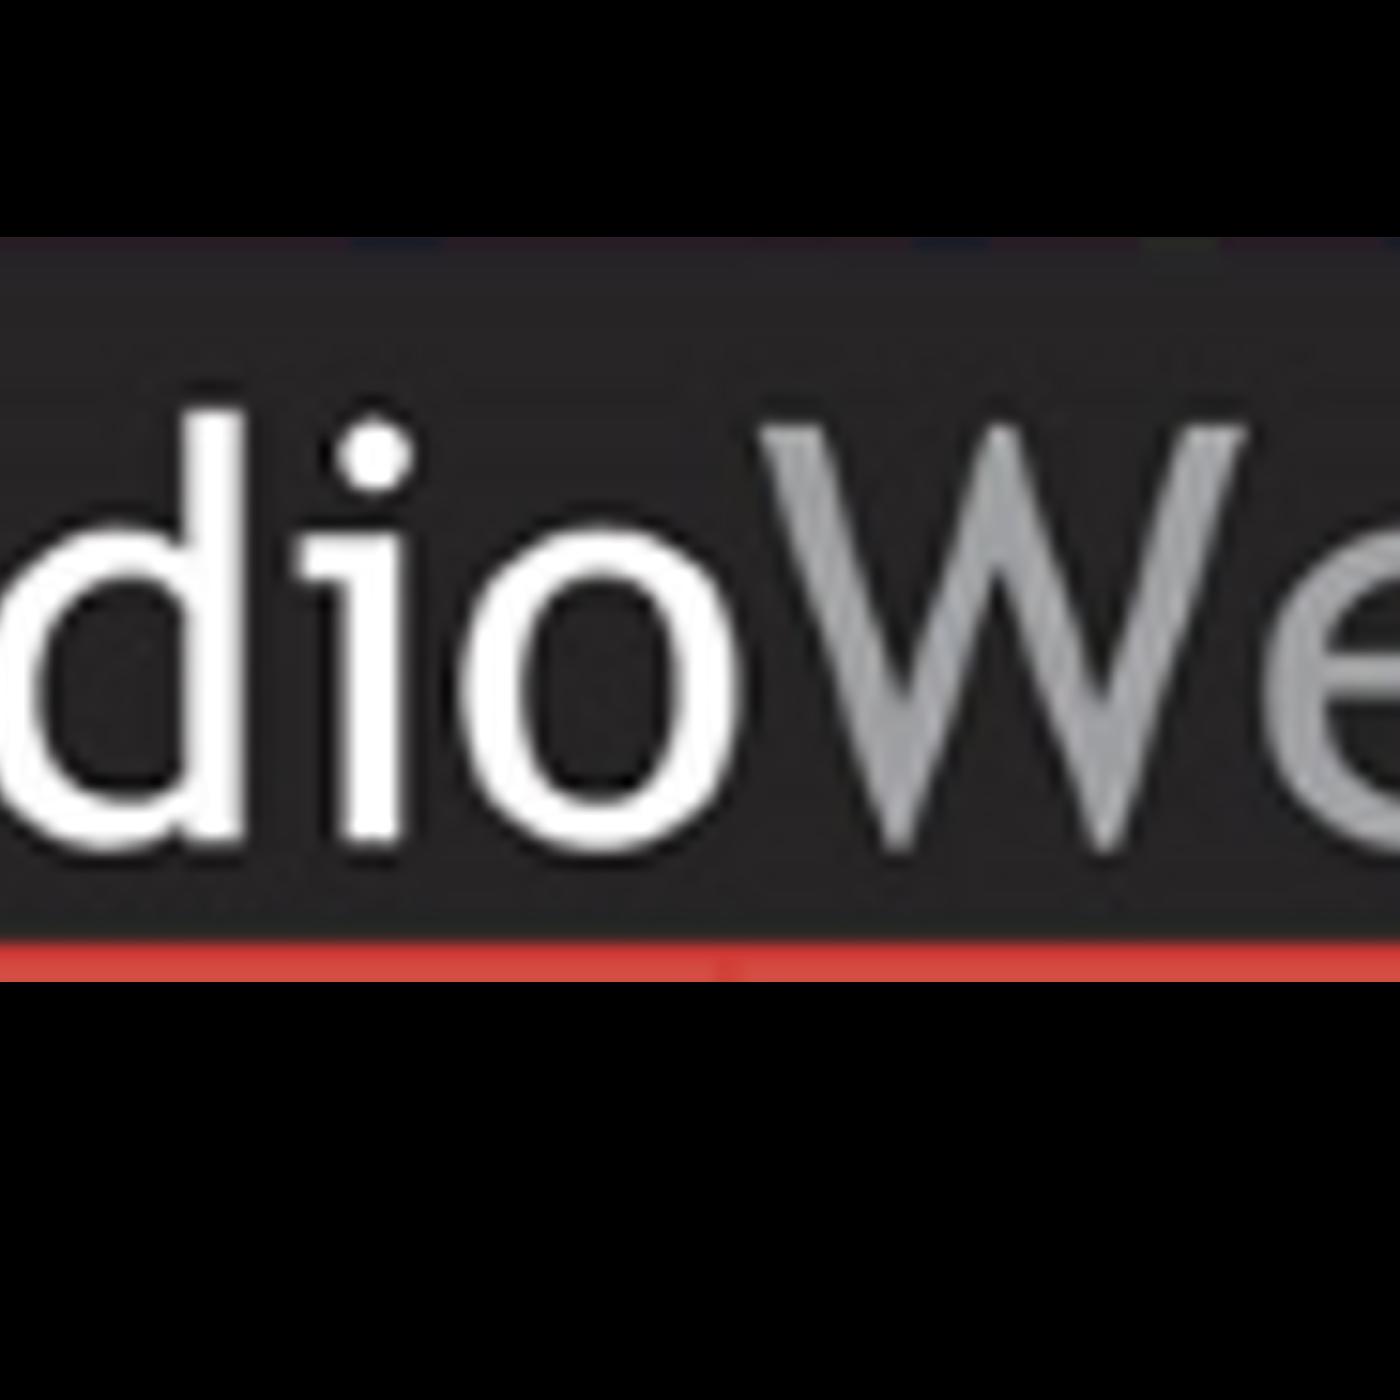 Hfo8boqrqvigykxiqpc8 radiowest new